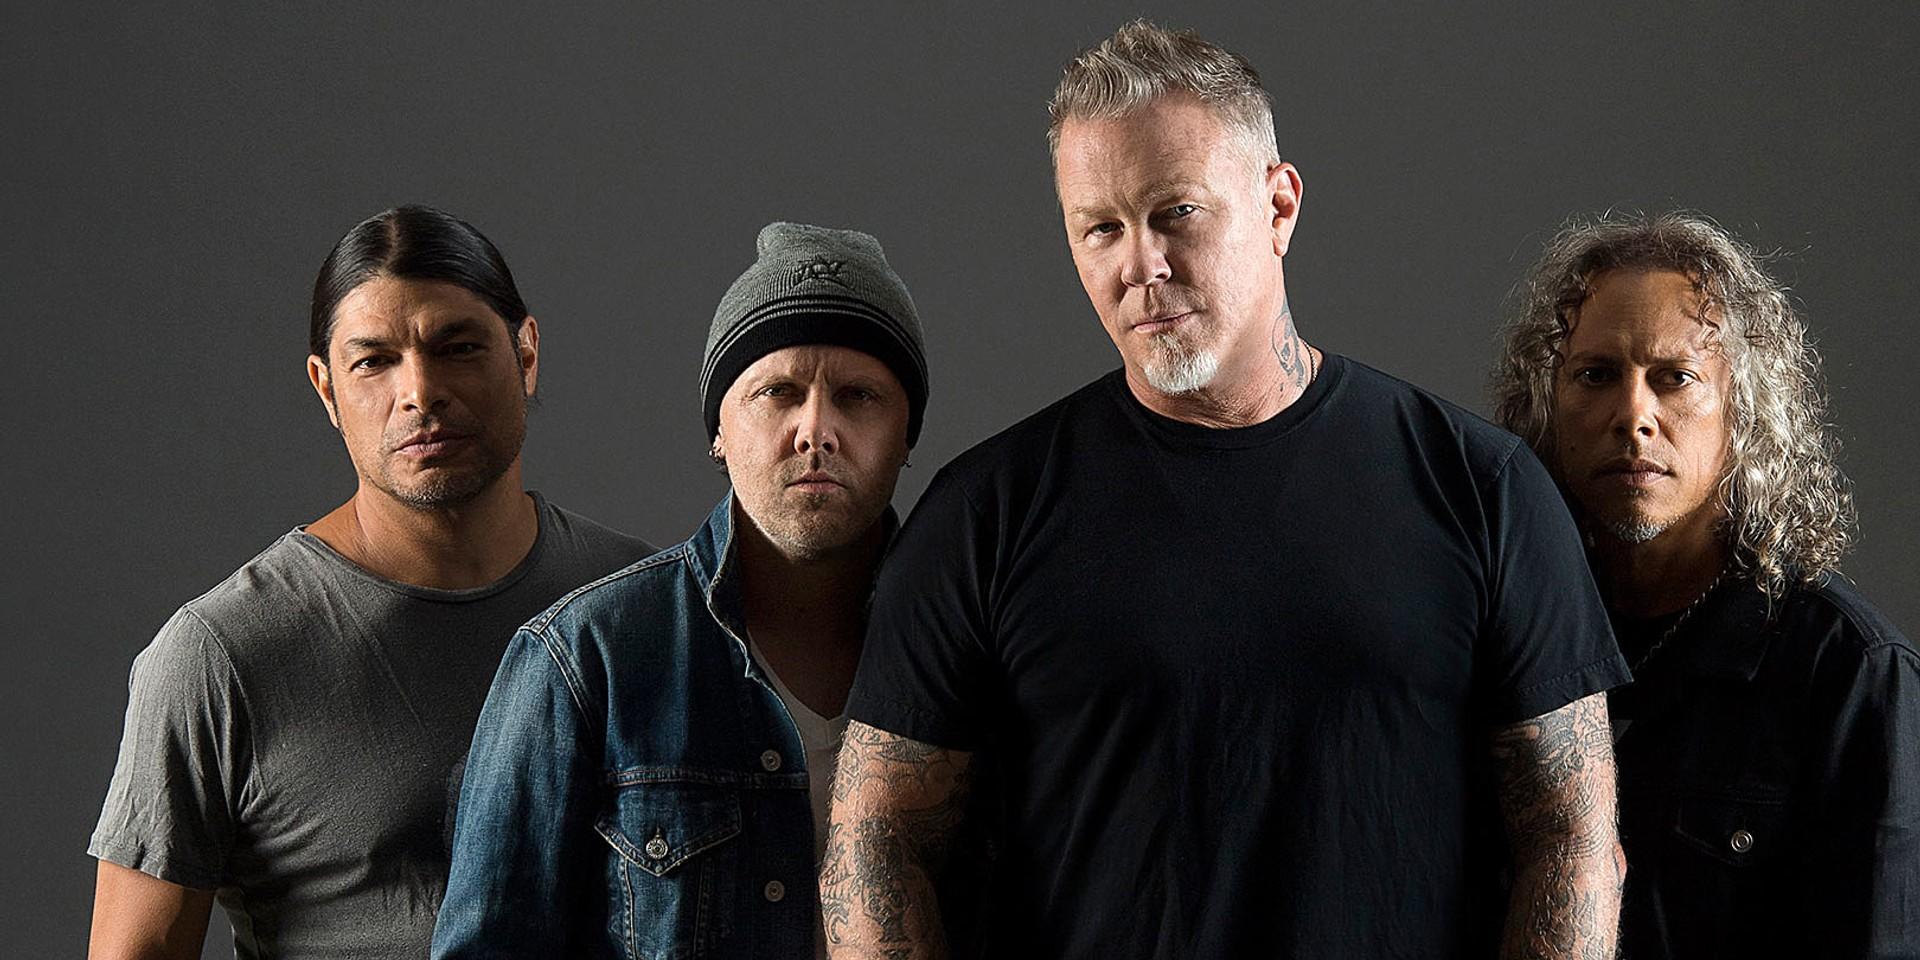 Metallica promises new album will arrive sooner than previous releases